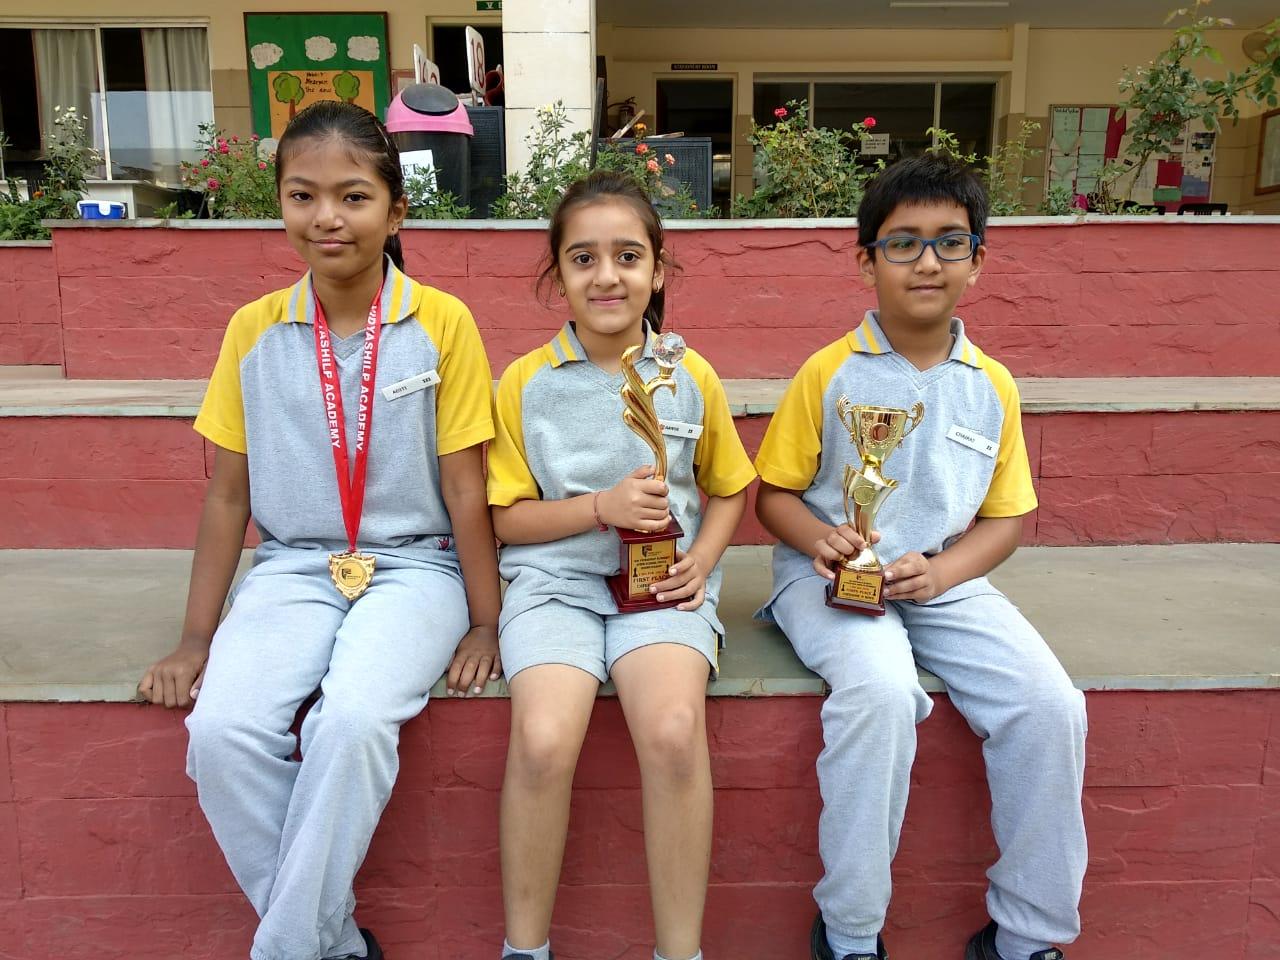 Winners of Interschool Chess championship held at Vidya Shilp Academy on 13<sup>th</sup> February 2019.